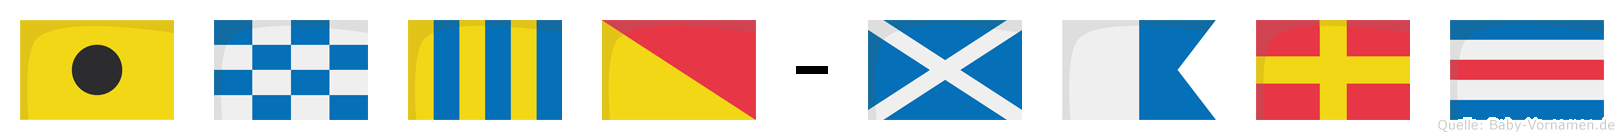 Ingo-Marc im Flaggenalphabet